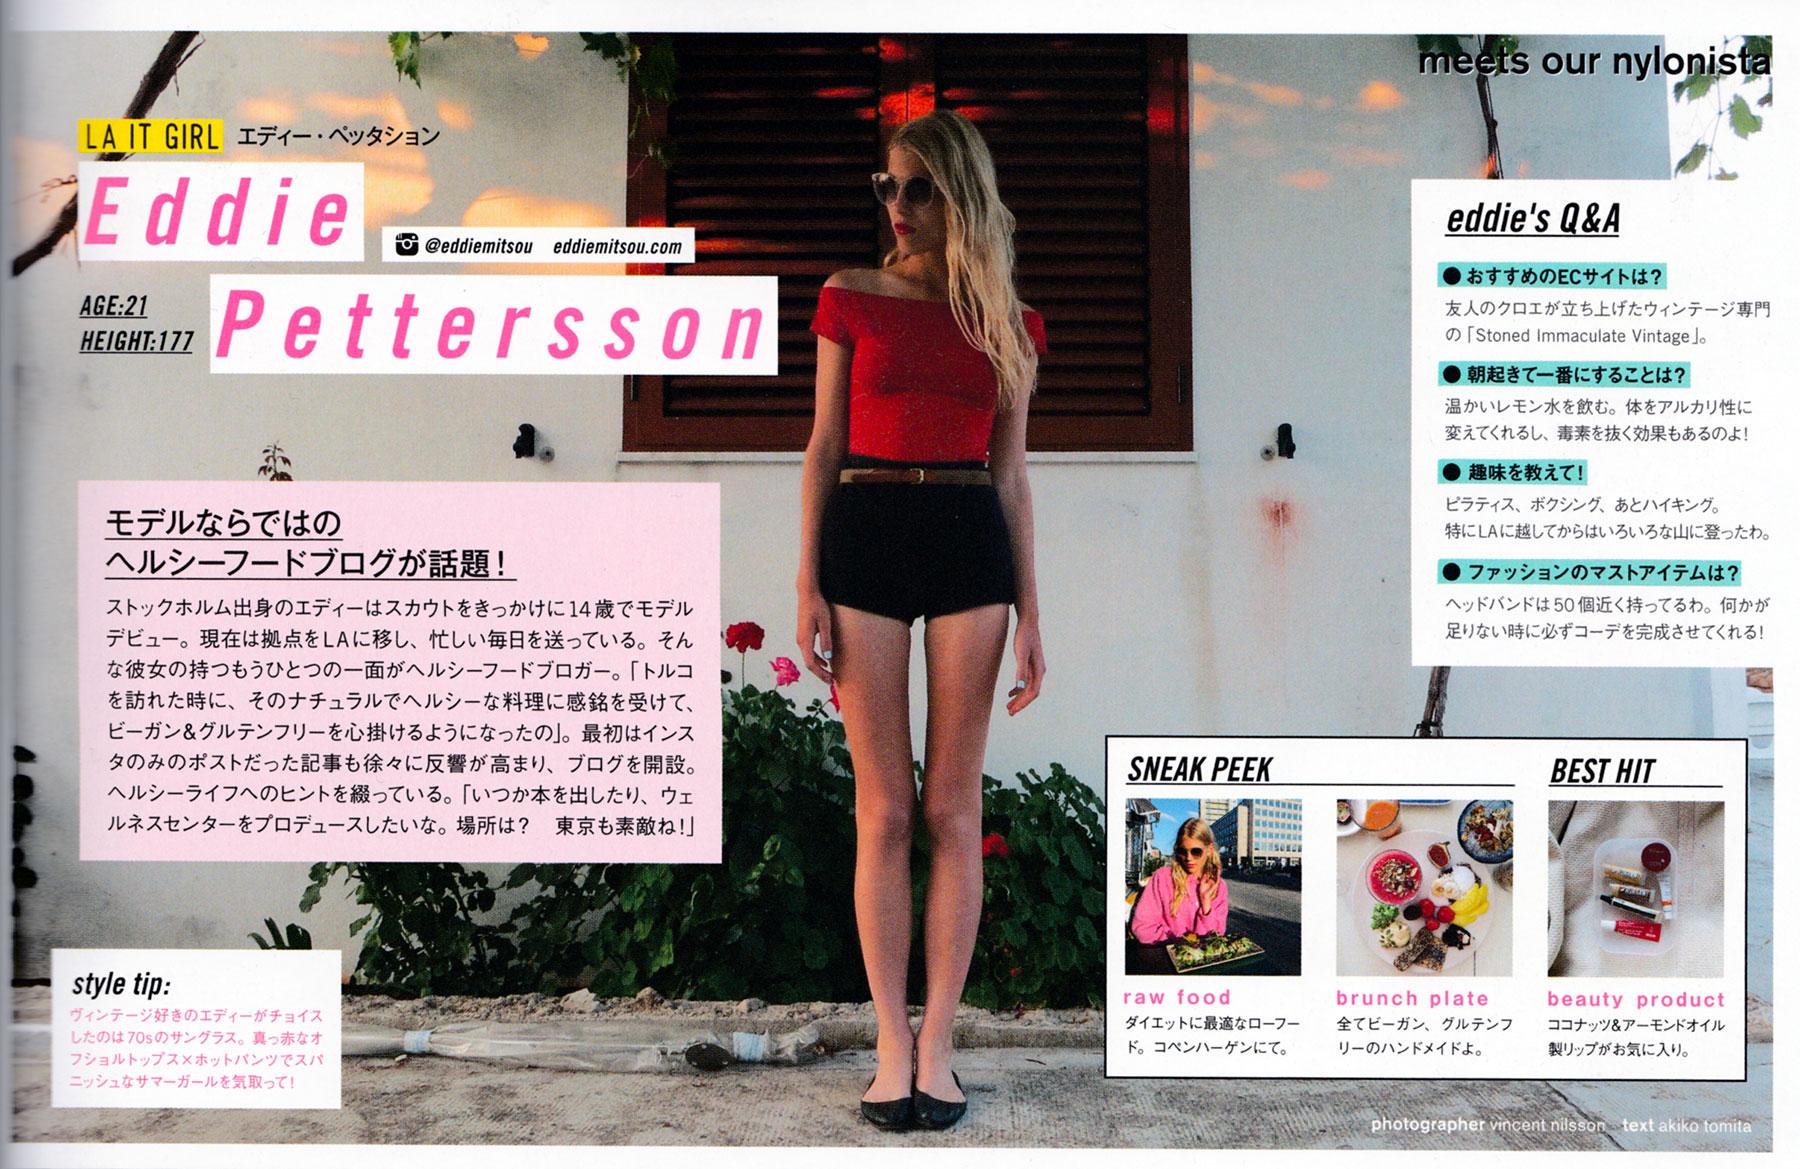 eddie_nylon_japan